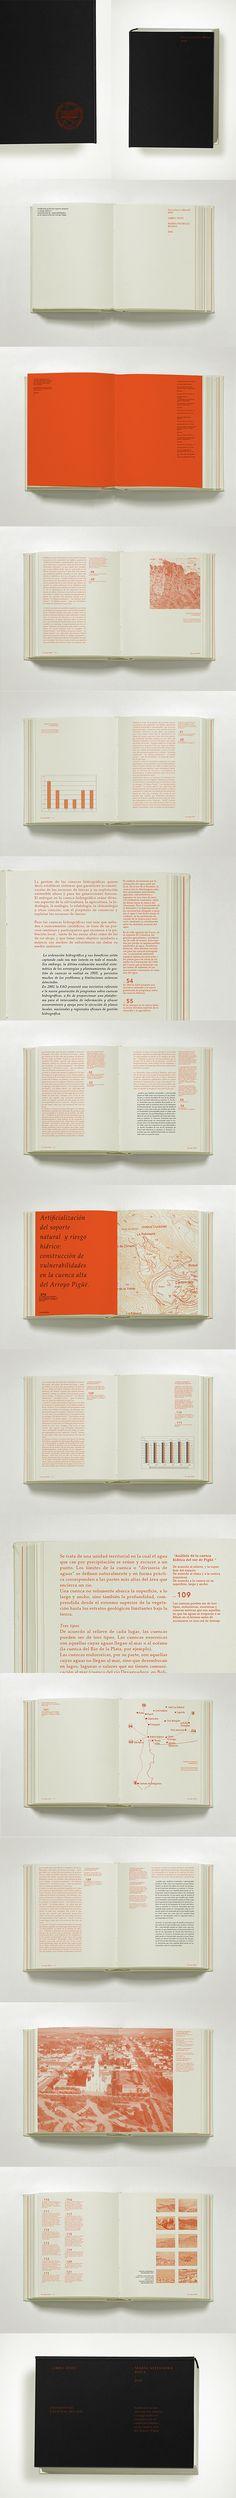 Thesis book, Roca, 2012